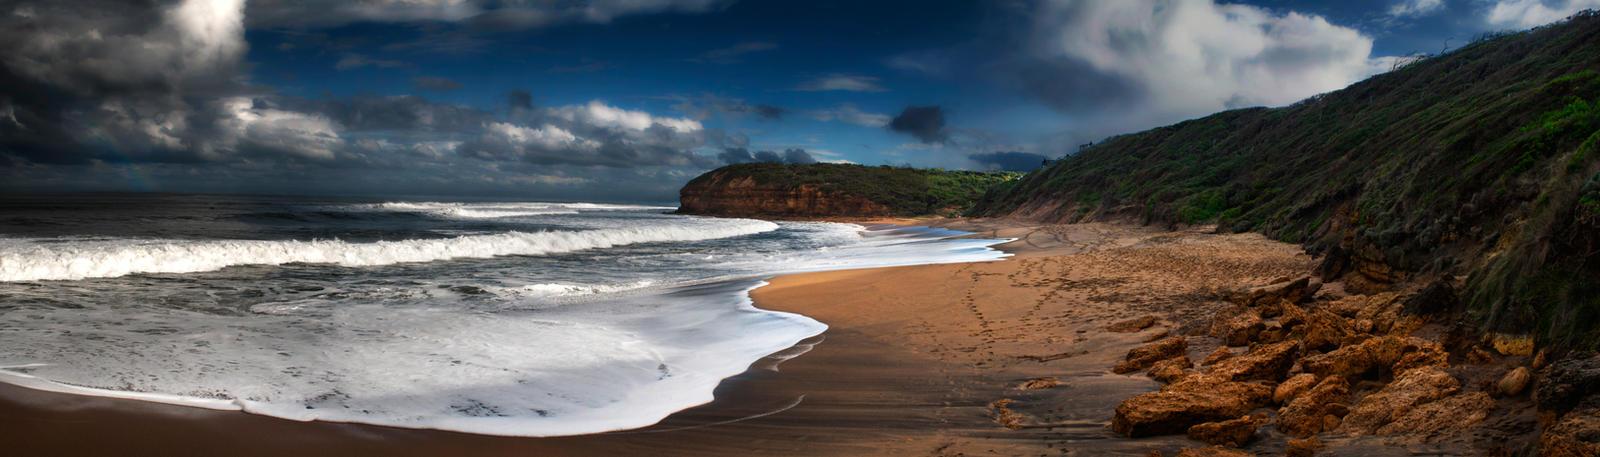 The Surf by DavidNowak